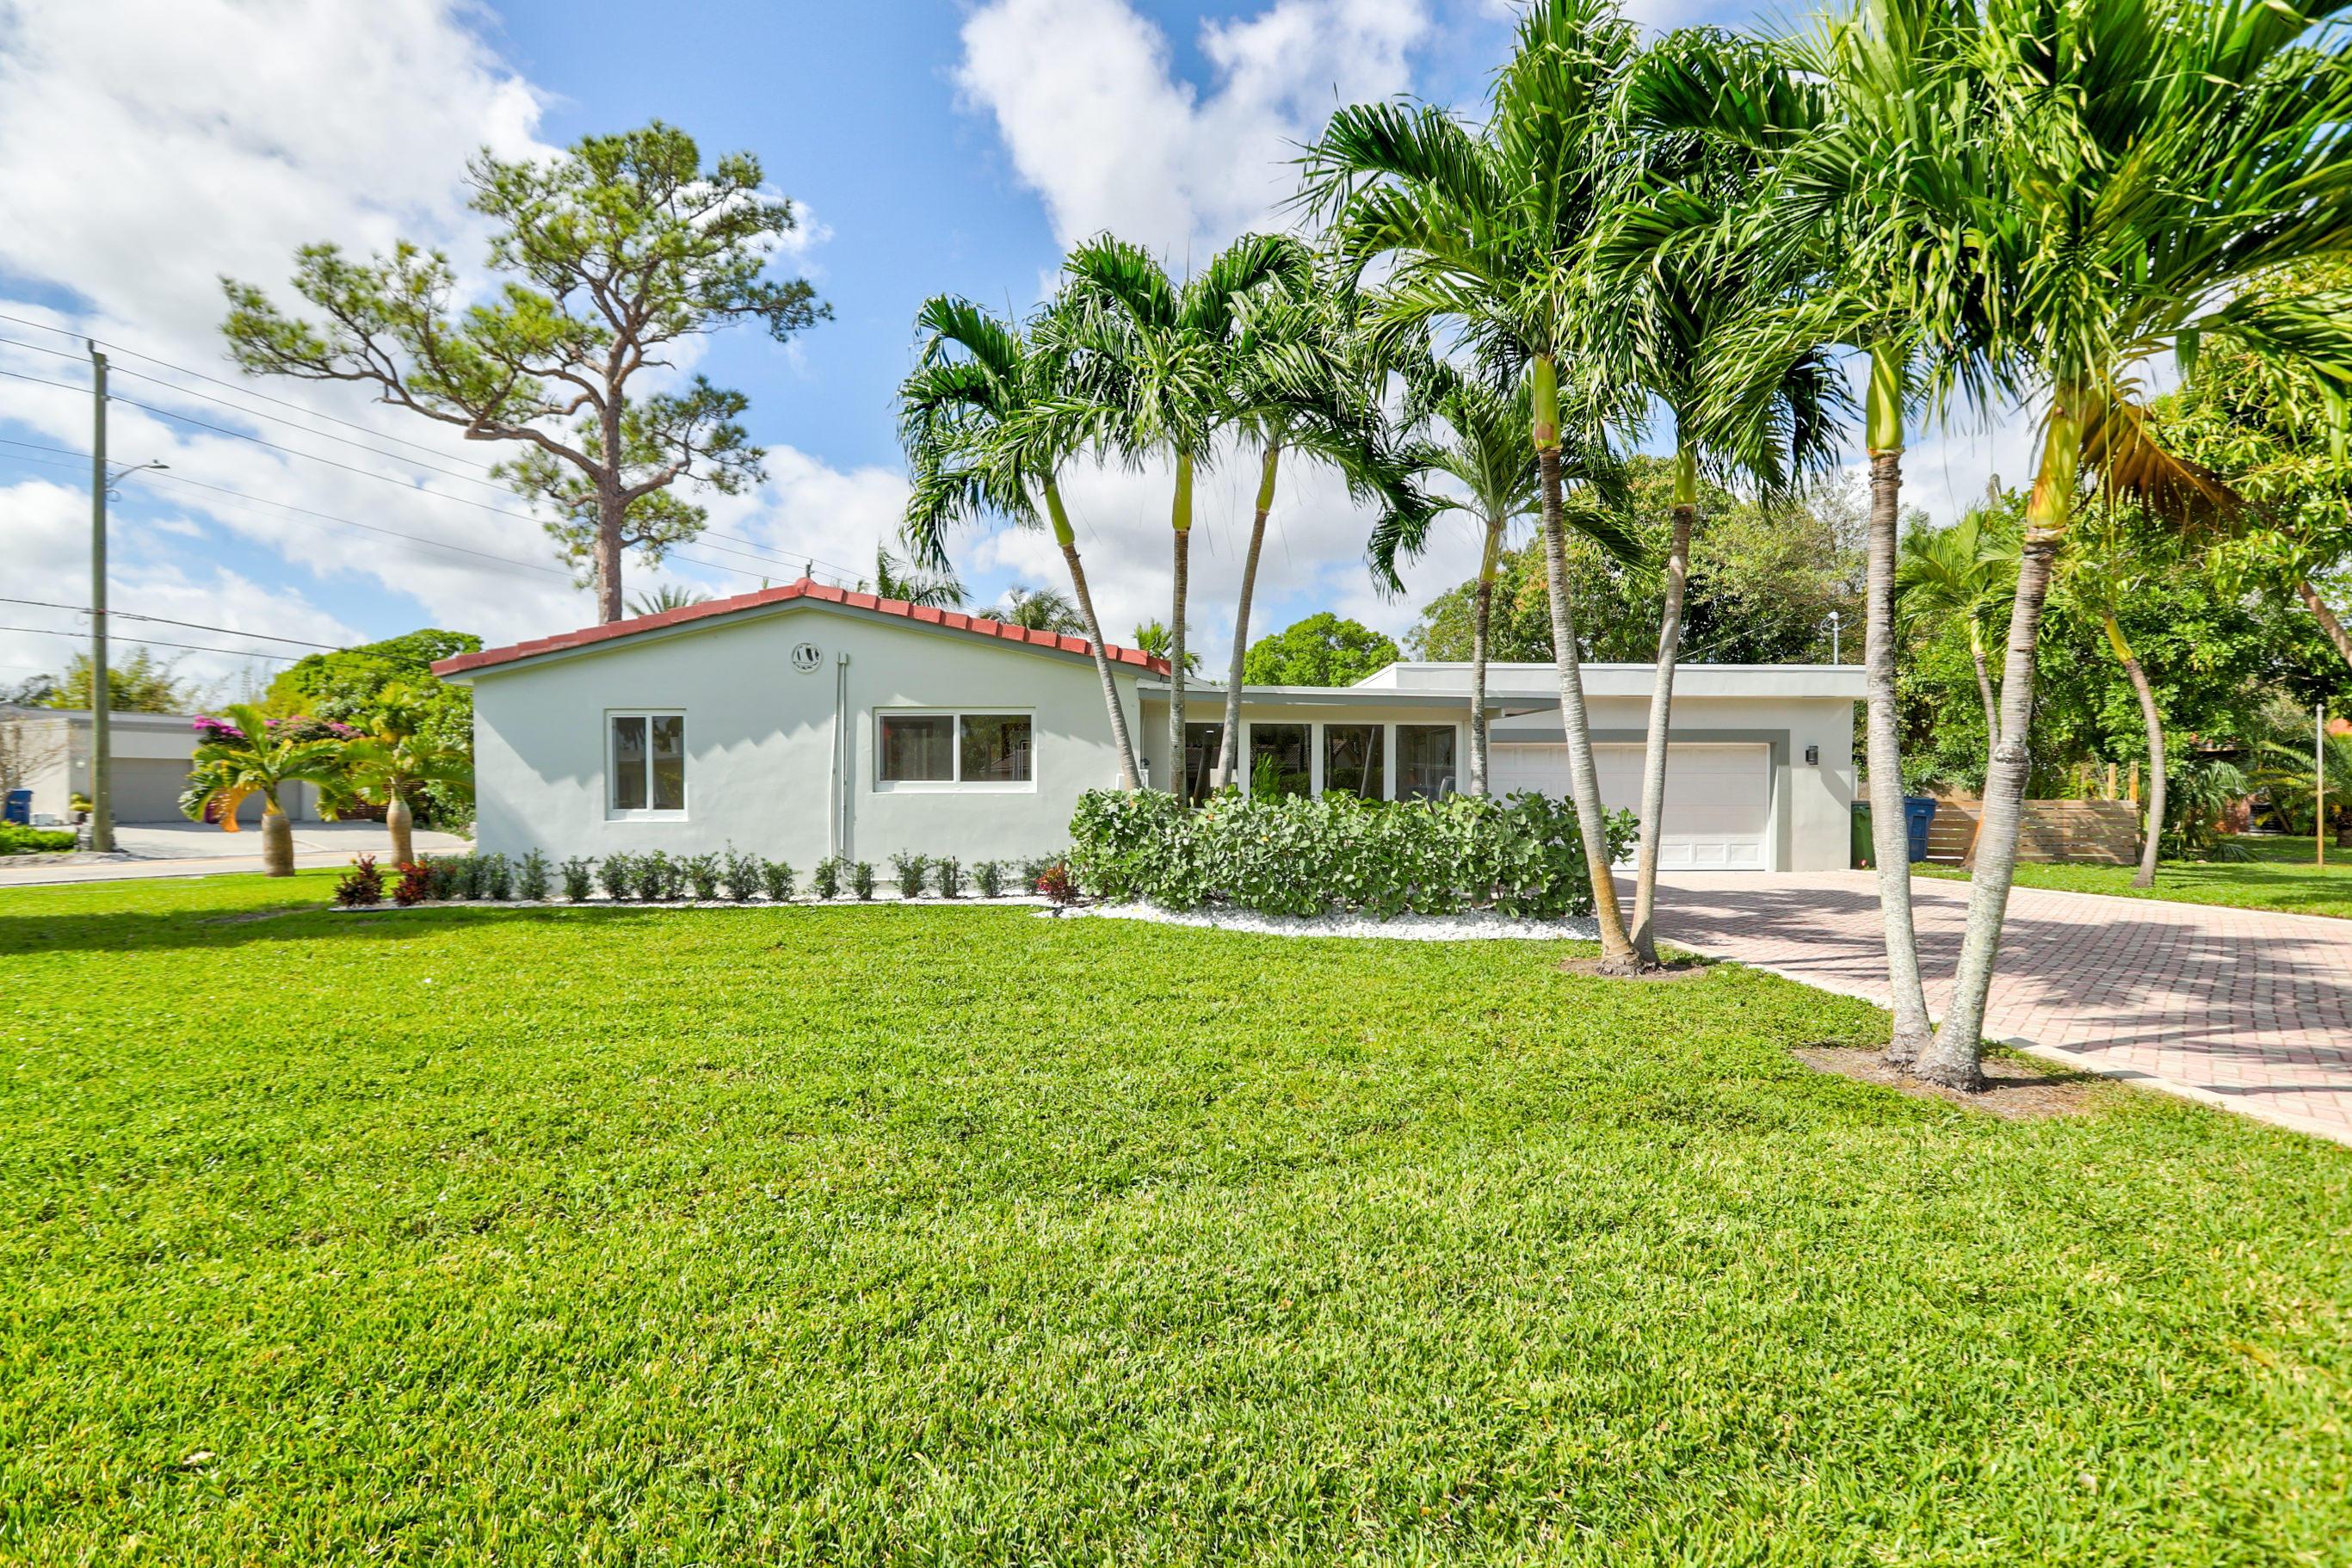 43 NE 26 Street Wilton Manors FL 33305